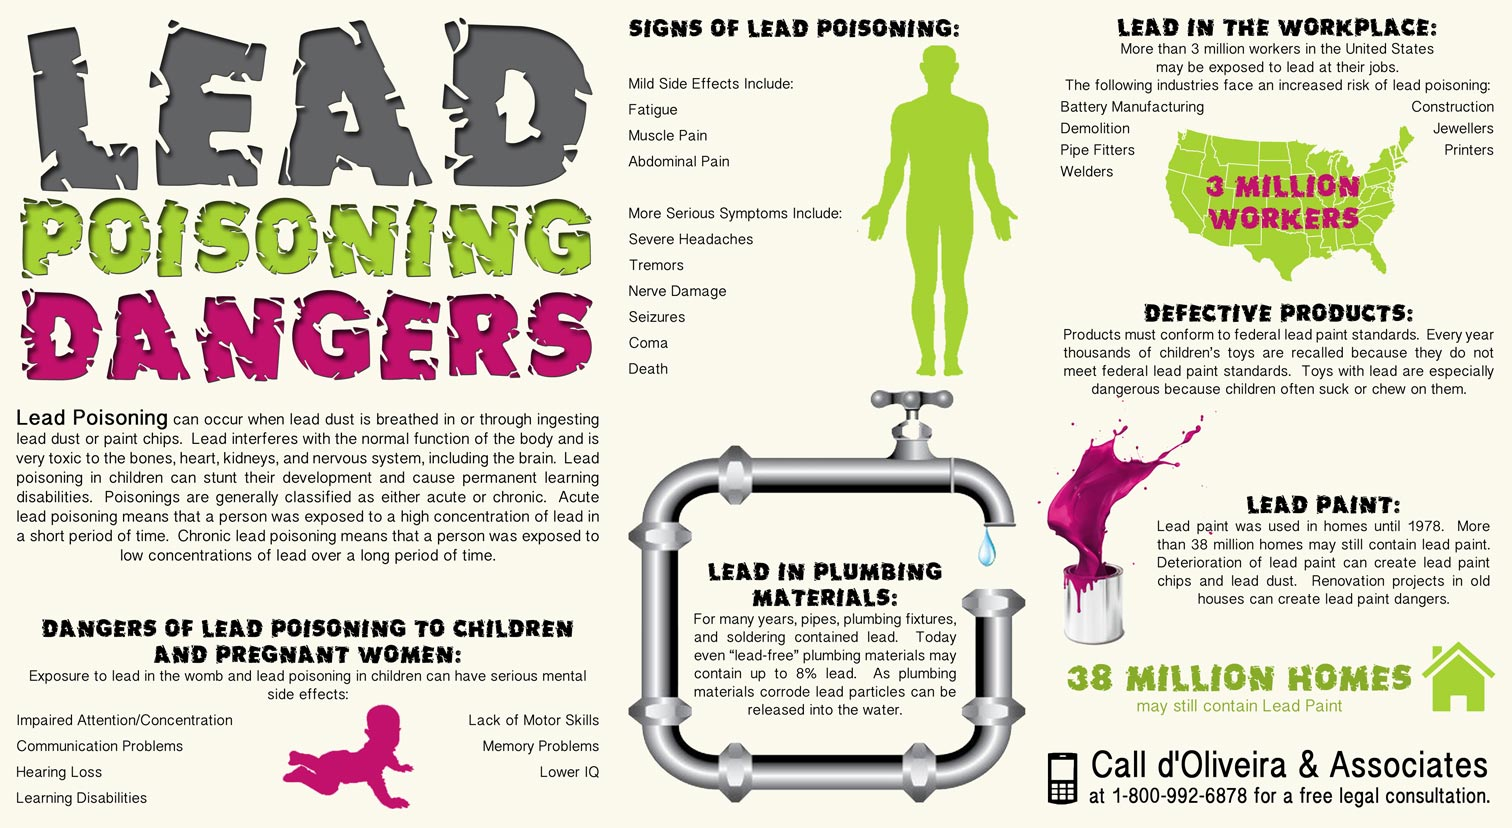 leadpoisoninglawyerdangersandsideeffectsofleadpoisoningtochildreninfographic_525e7b867f5df